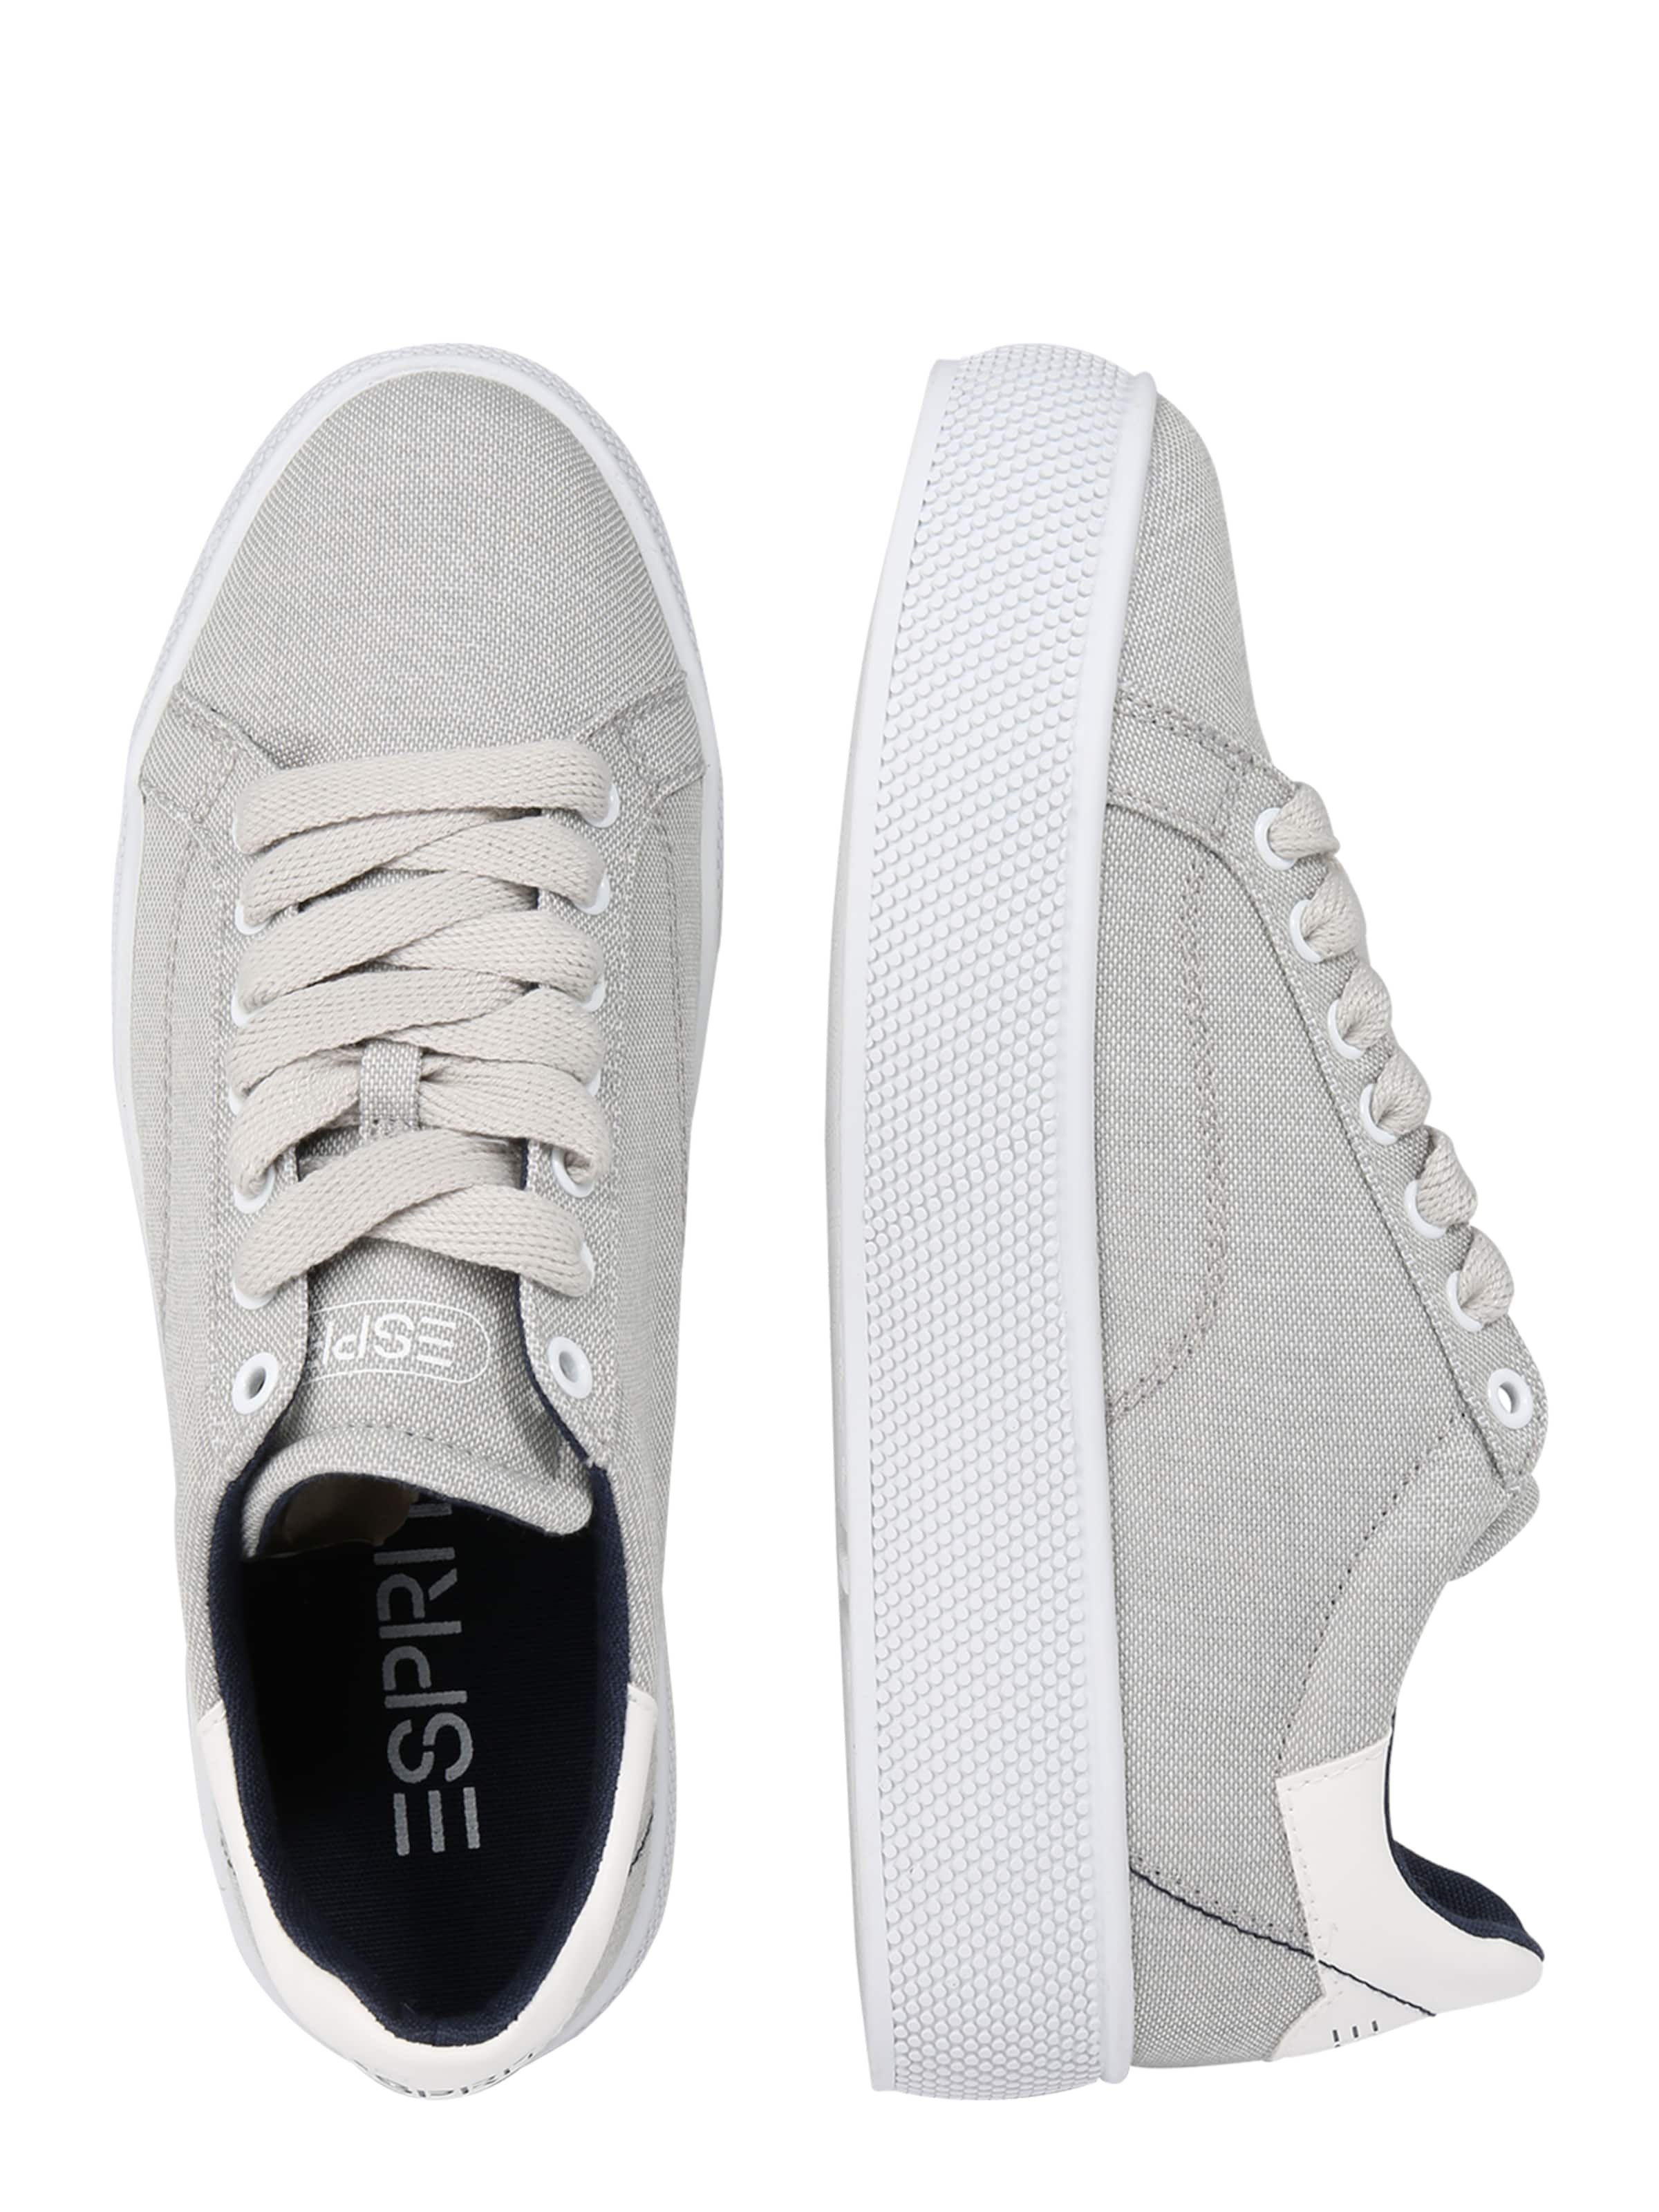 Hellgrau Esprit In Sneaker Lu' 'babika Co mw8n0vN